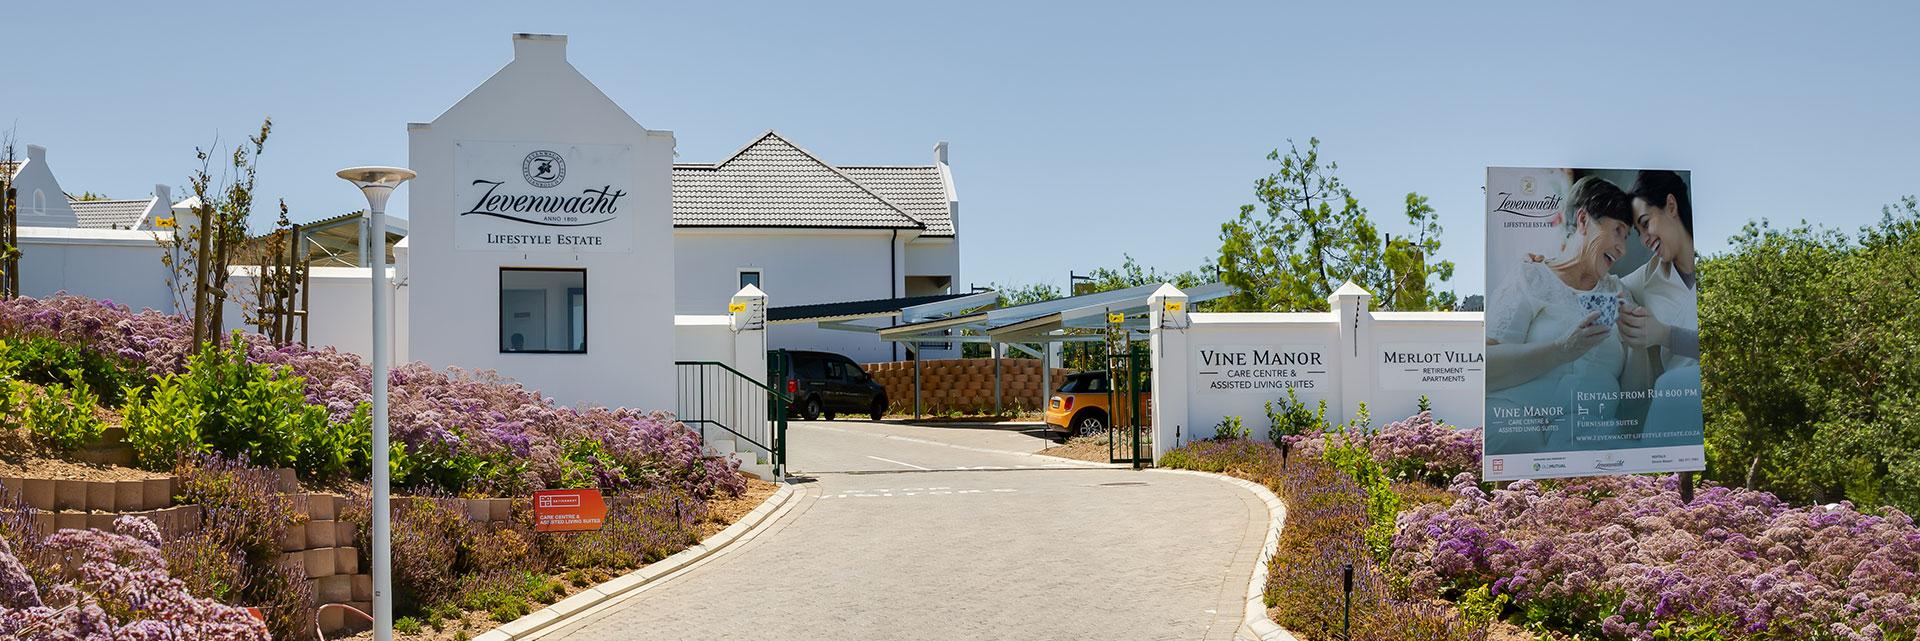 zevenwacht-lifestyle-estate-merlot-village-gatehouse-slide-1920x641